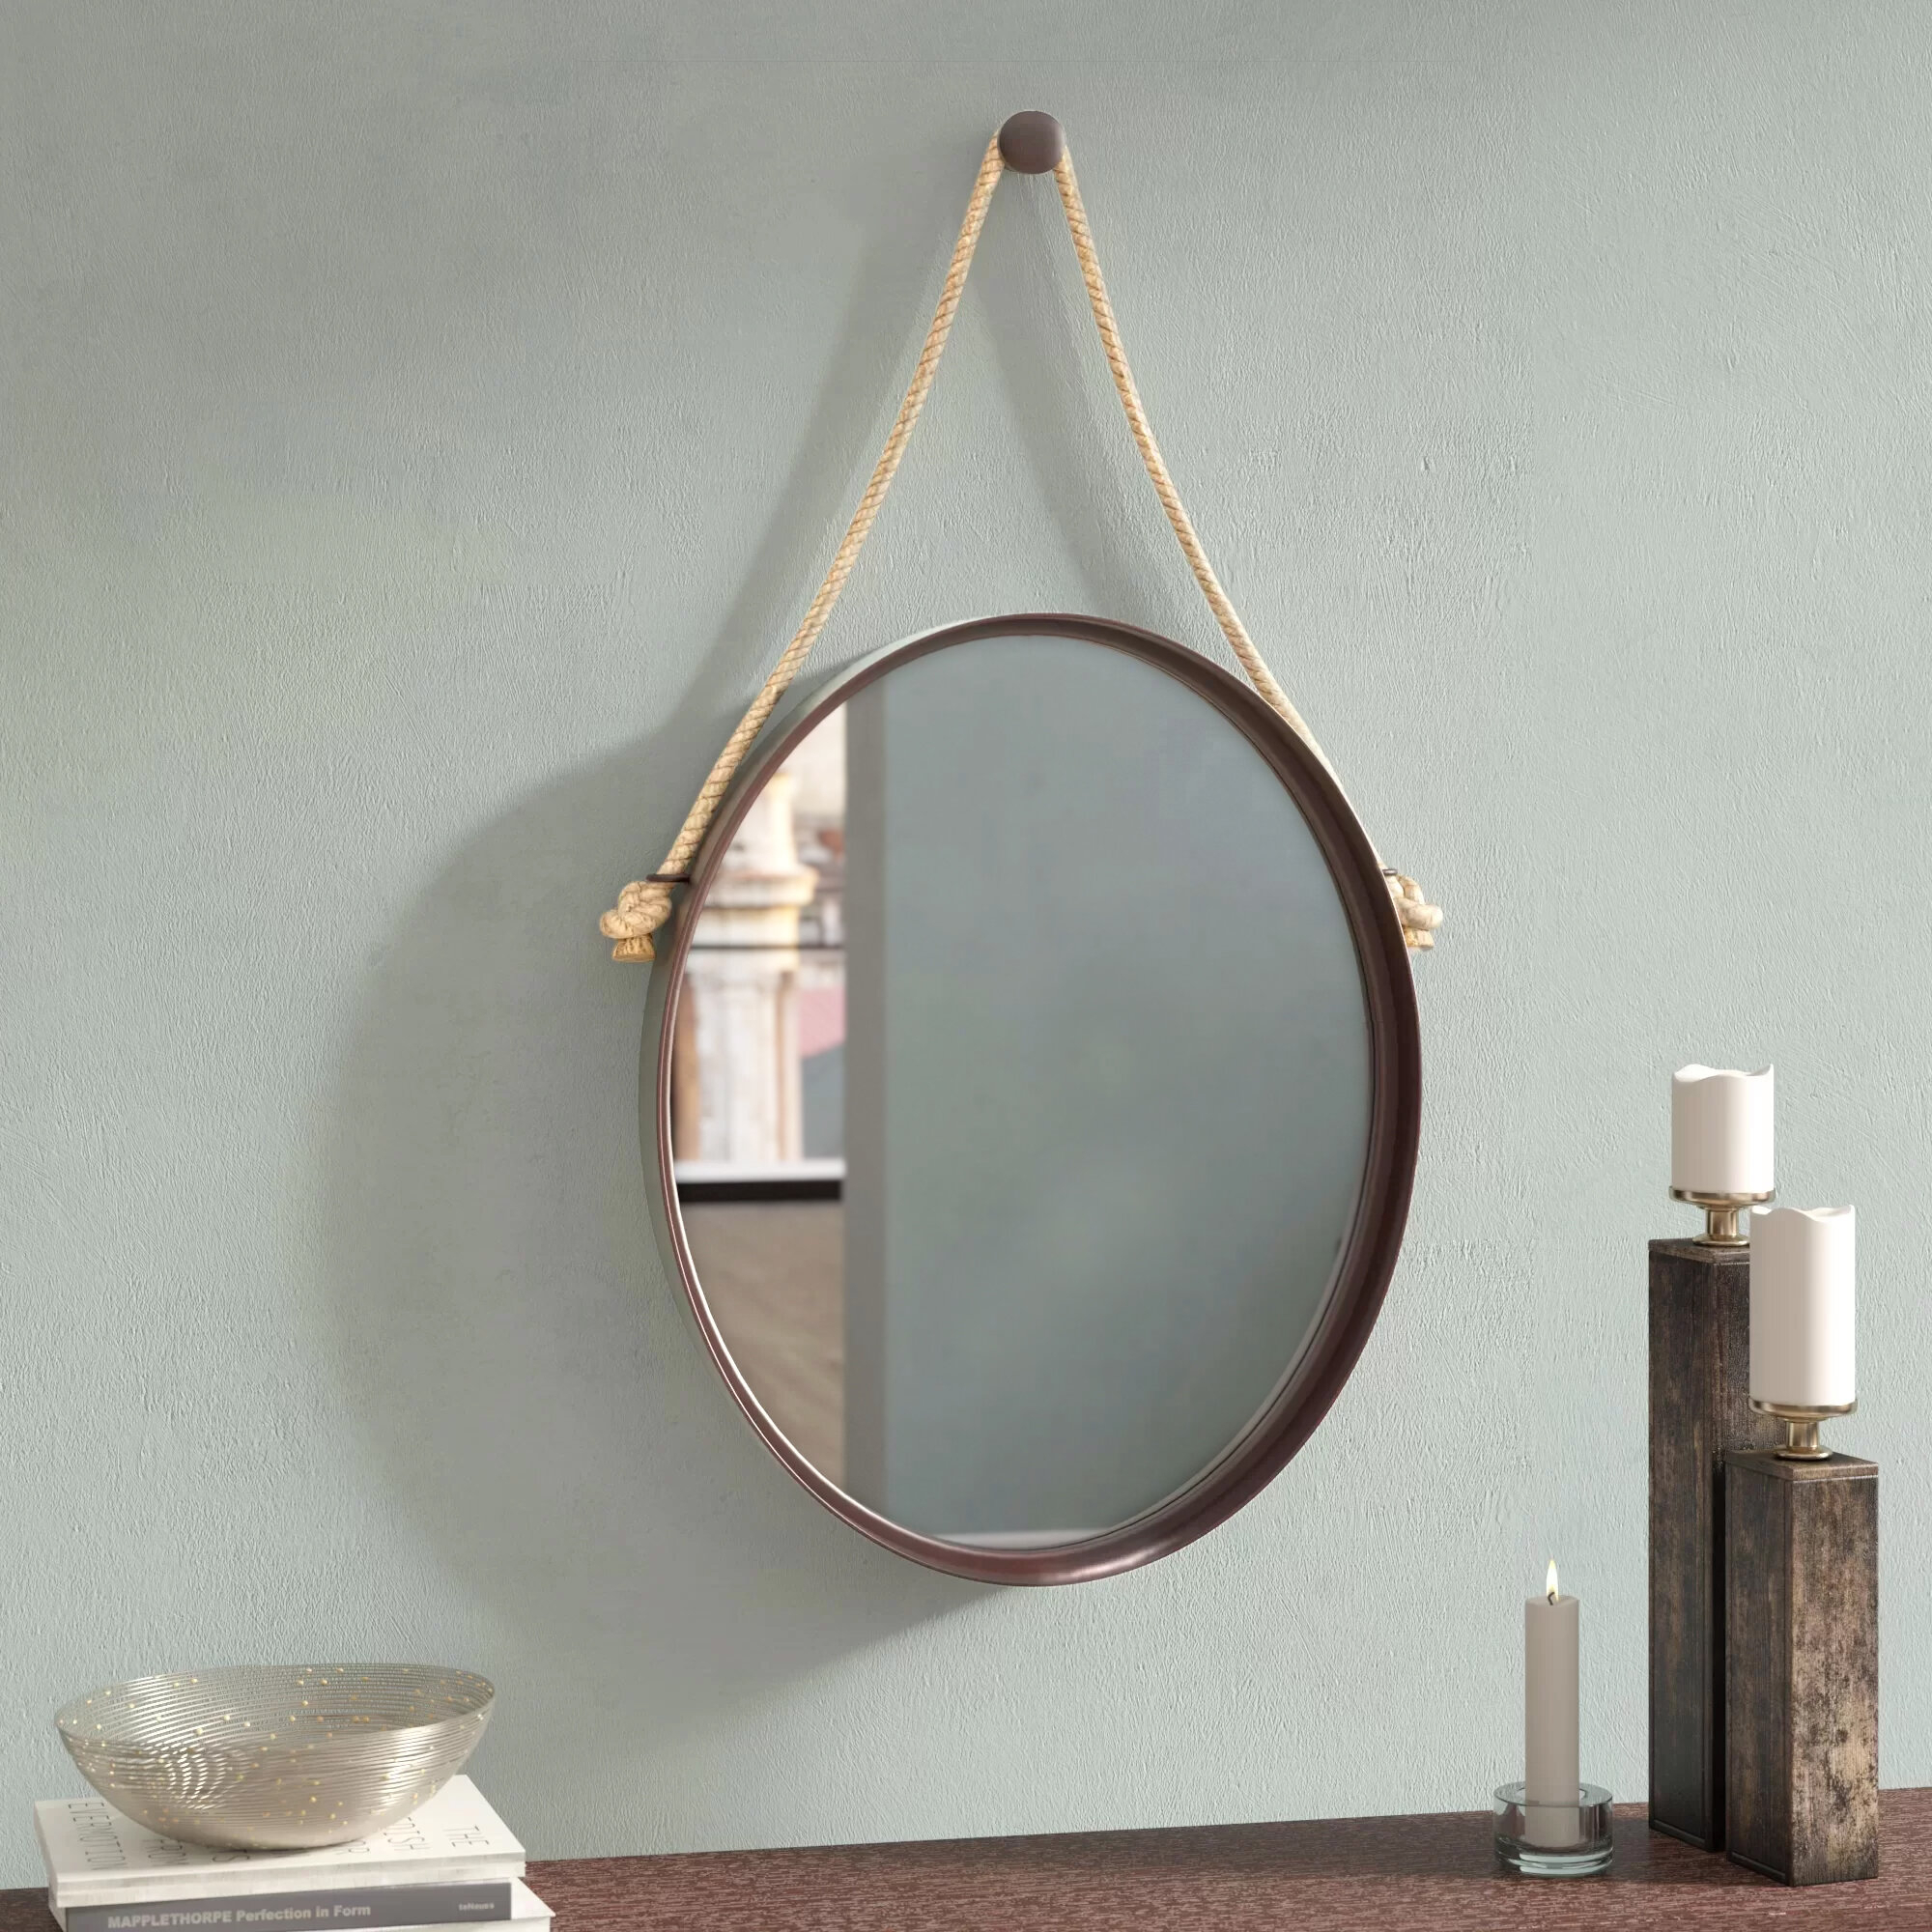 Bem Decorative Wall Mirror Inside Bem Decorative Wall Mirrors (View 3 of 20)